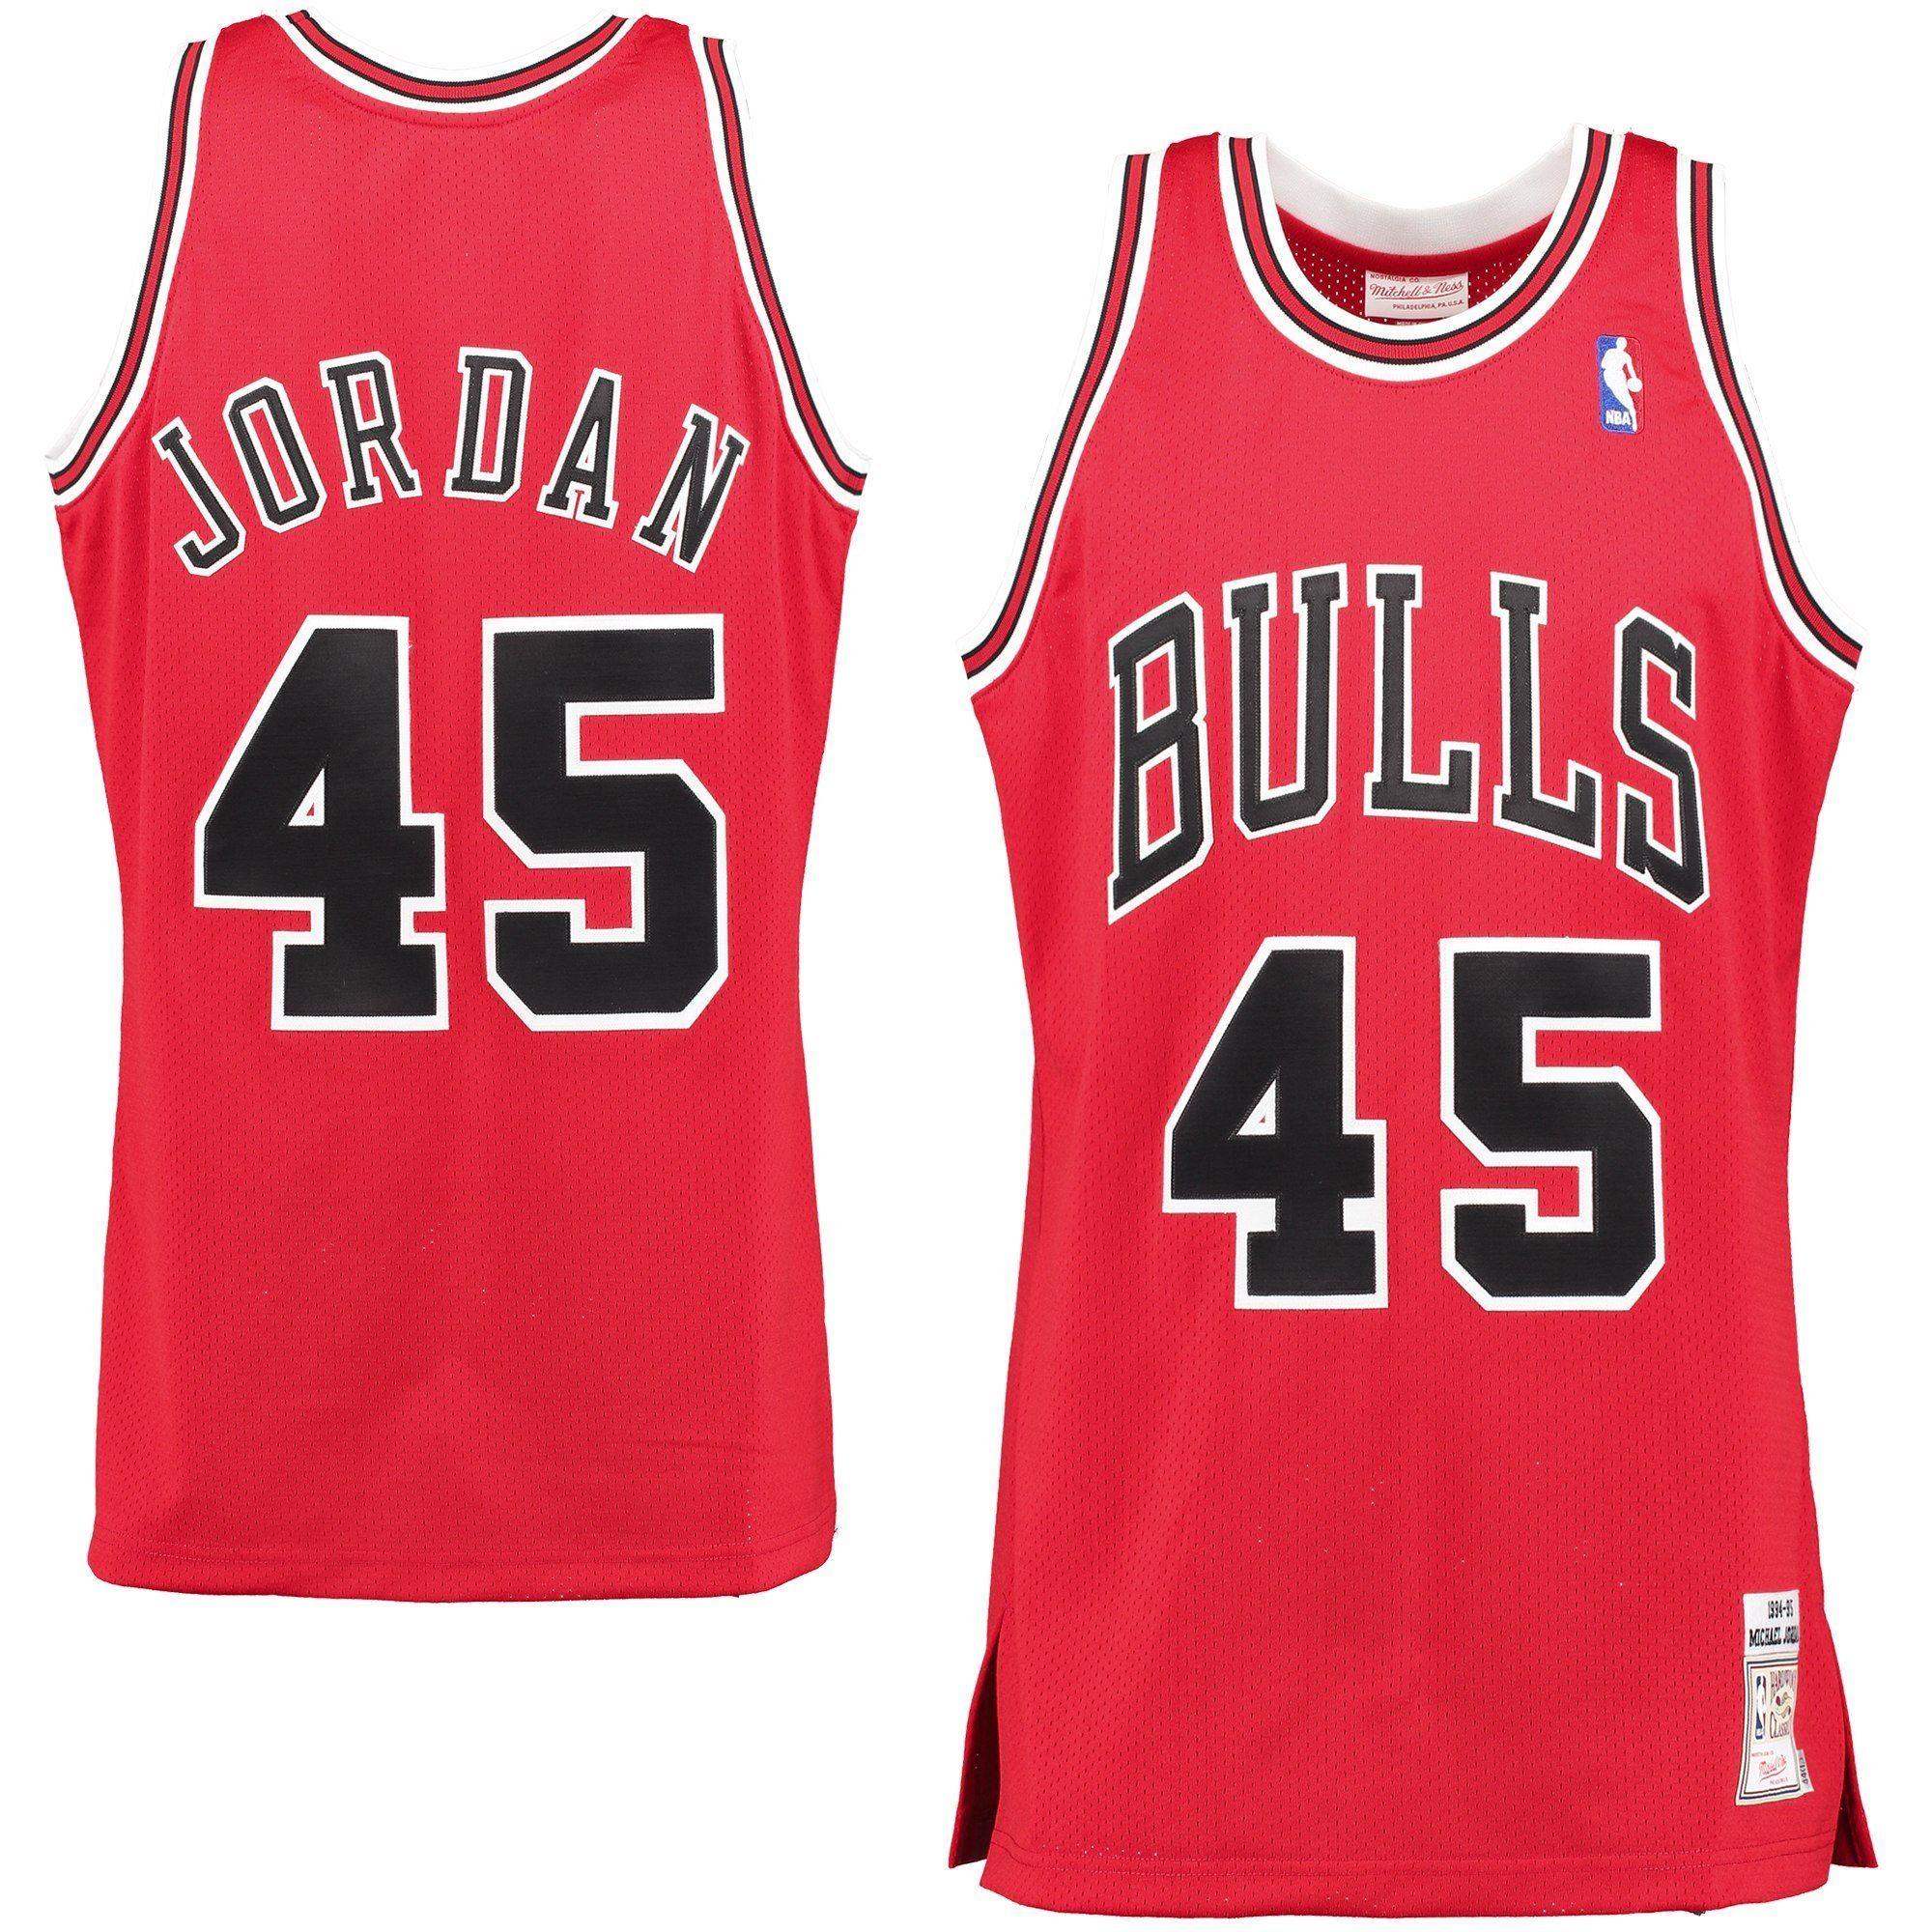 Chicago Bulls Michael Jordan #45 Jersey